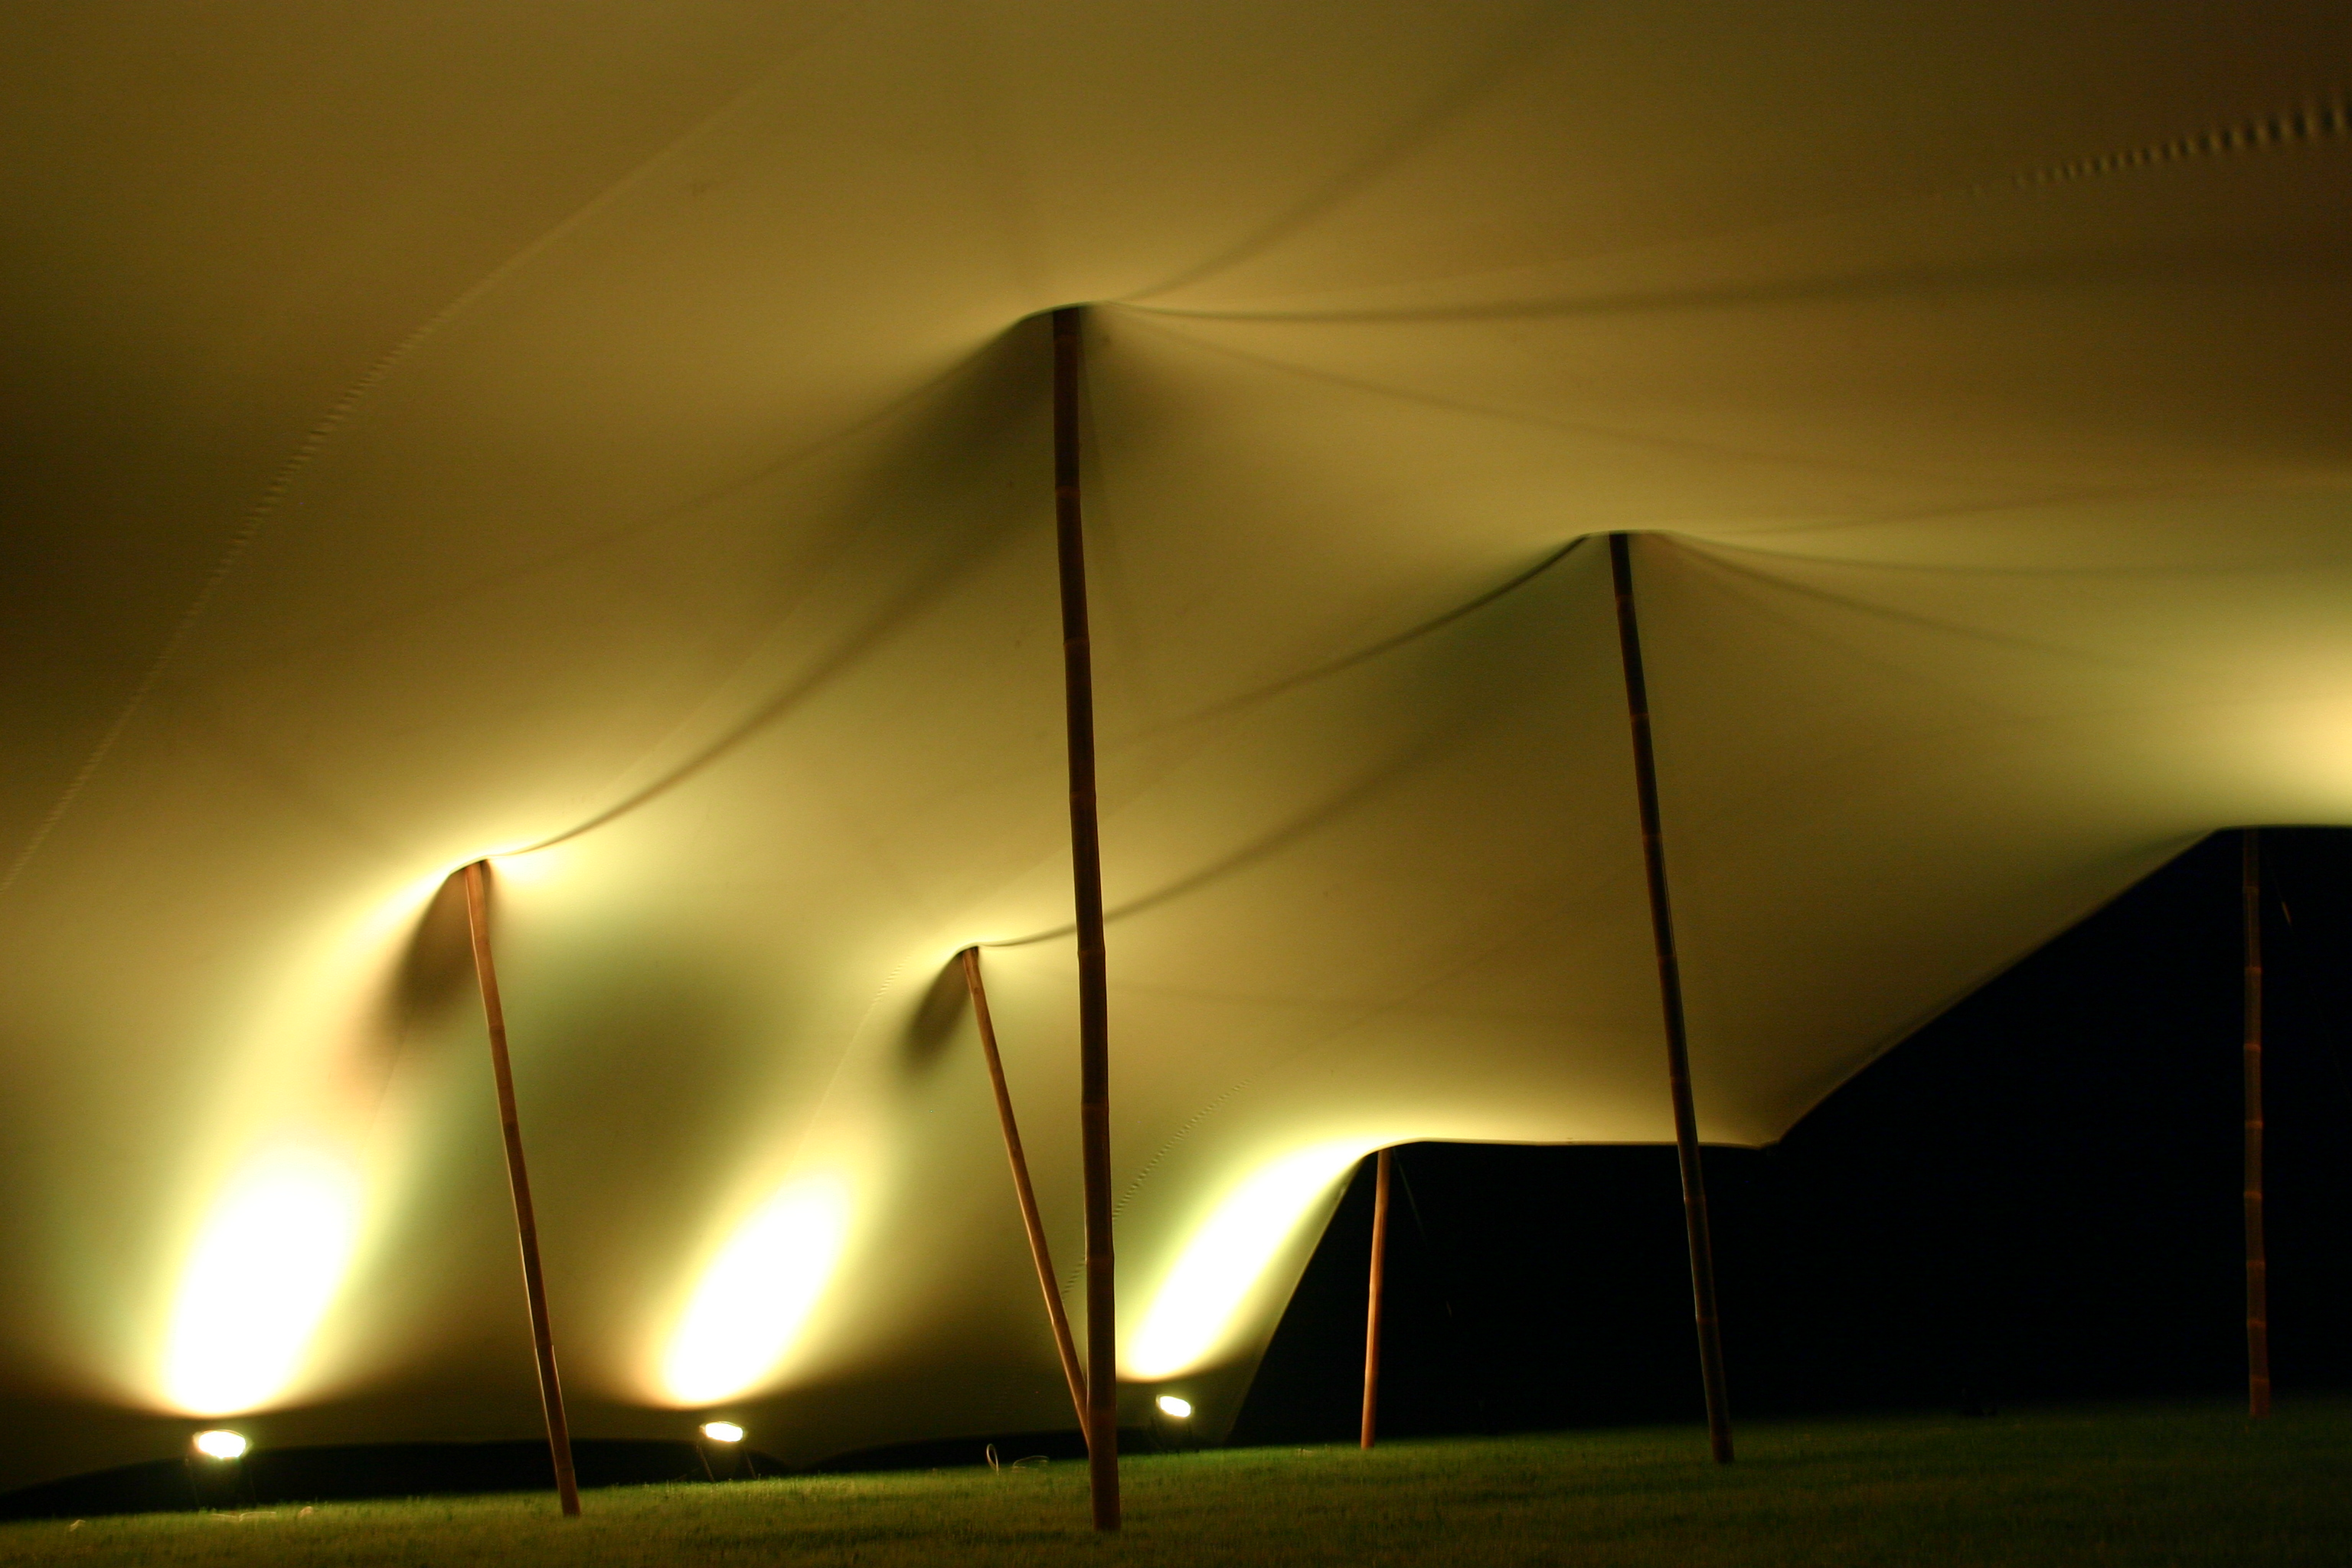 verlichting tentenverhuur starshade pagodetenten